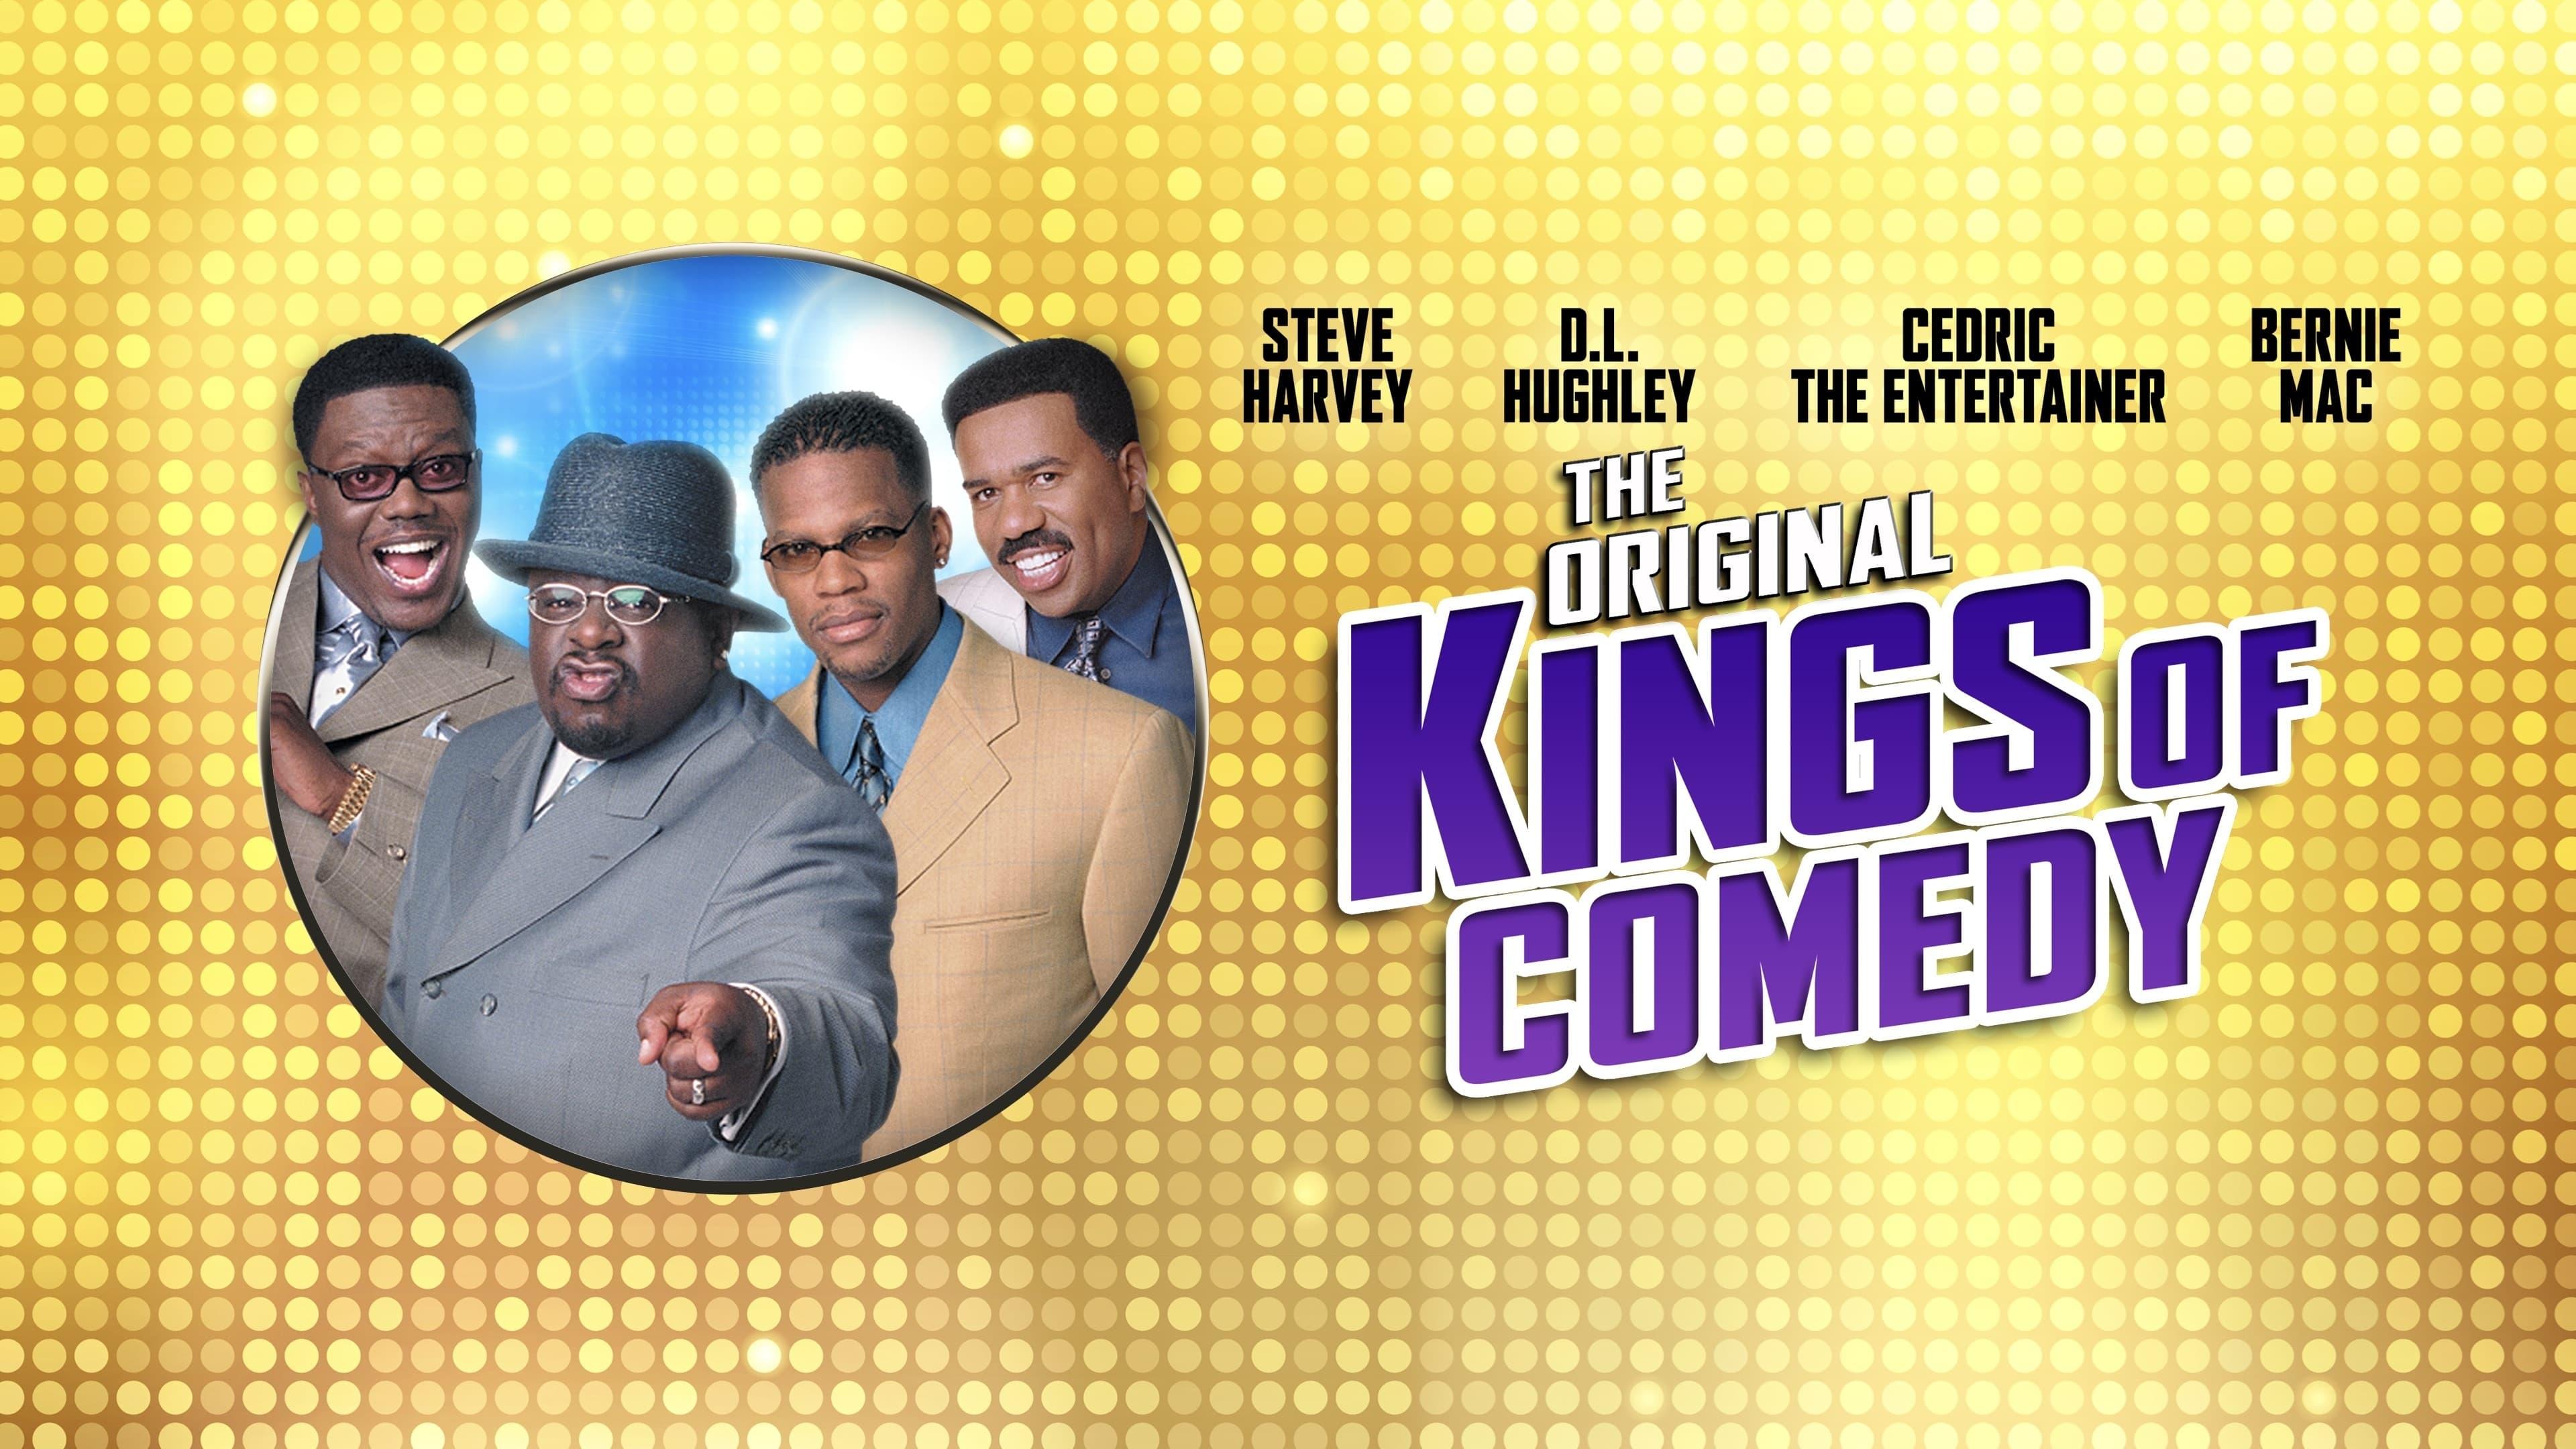 The Original Kings of Comedy